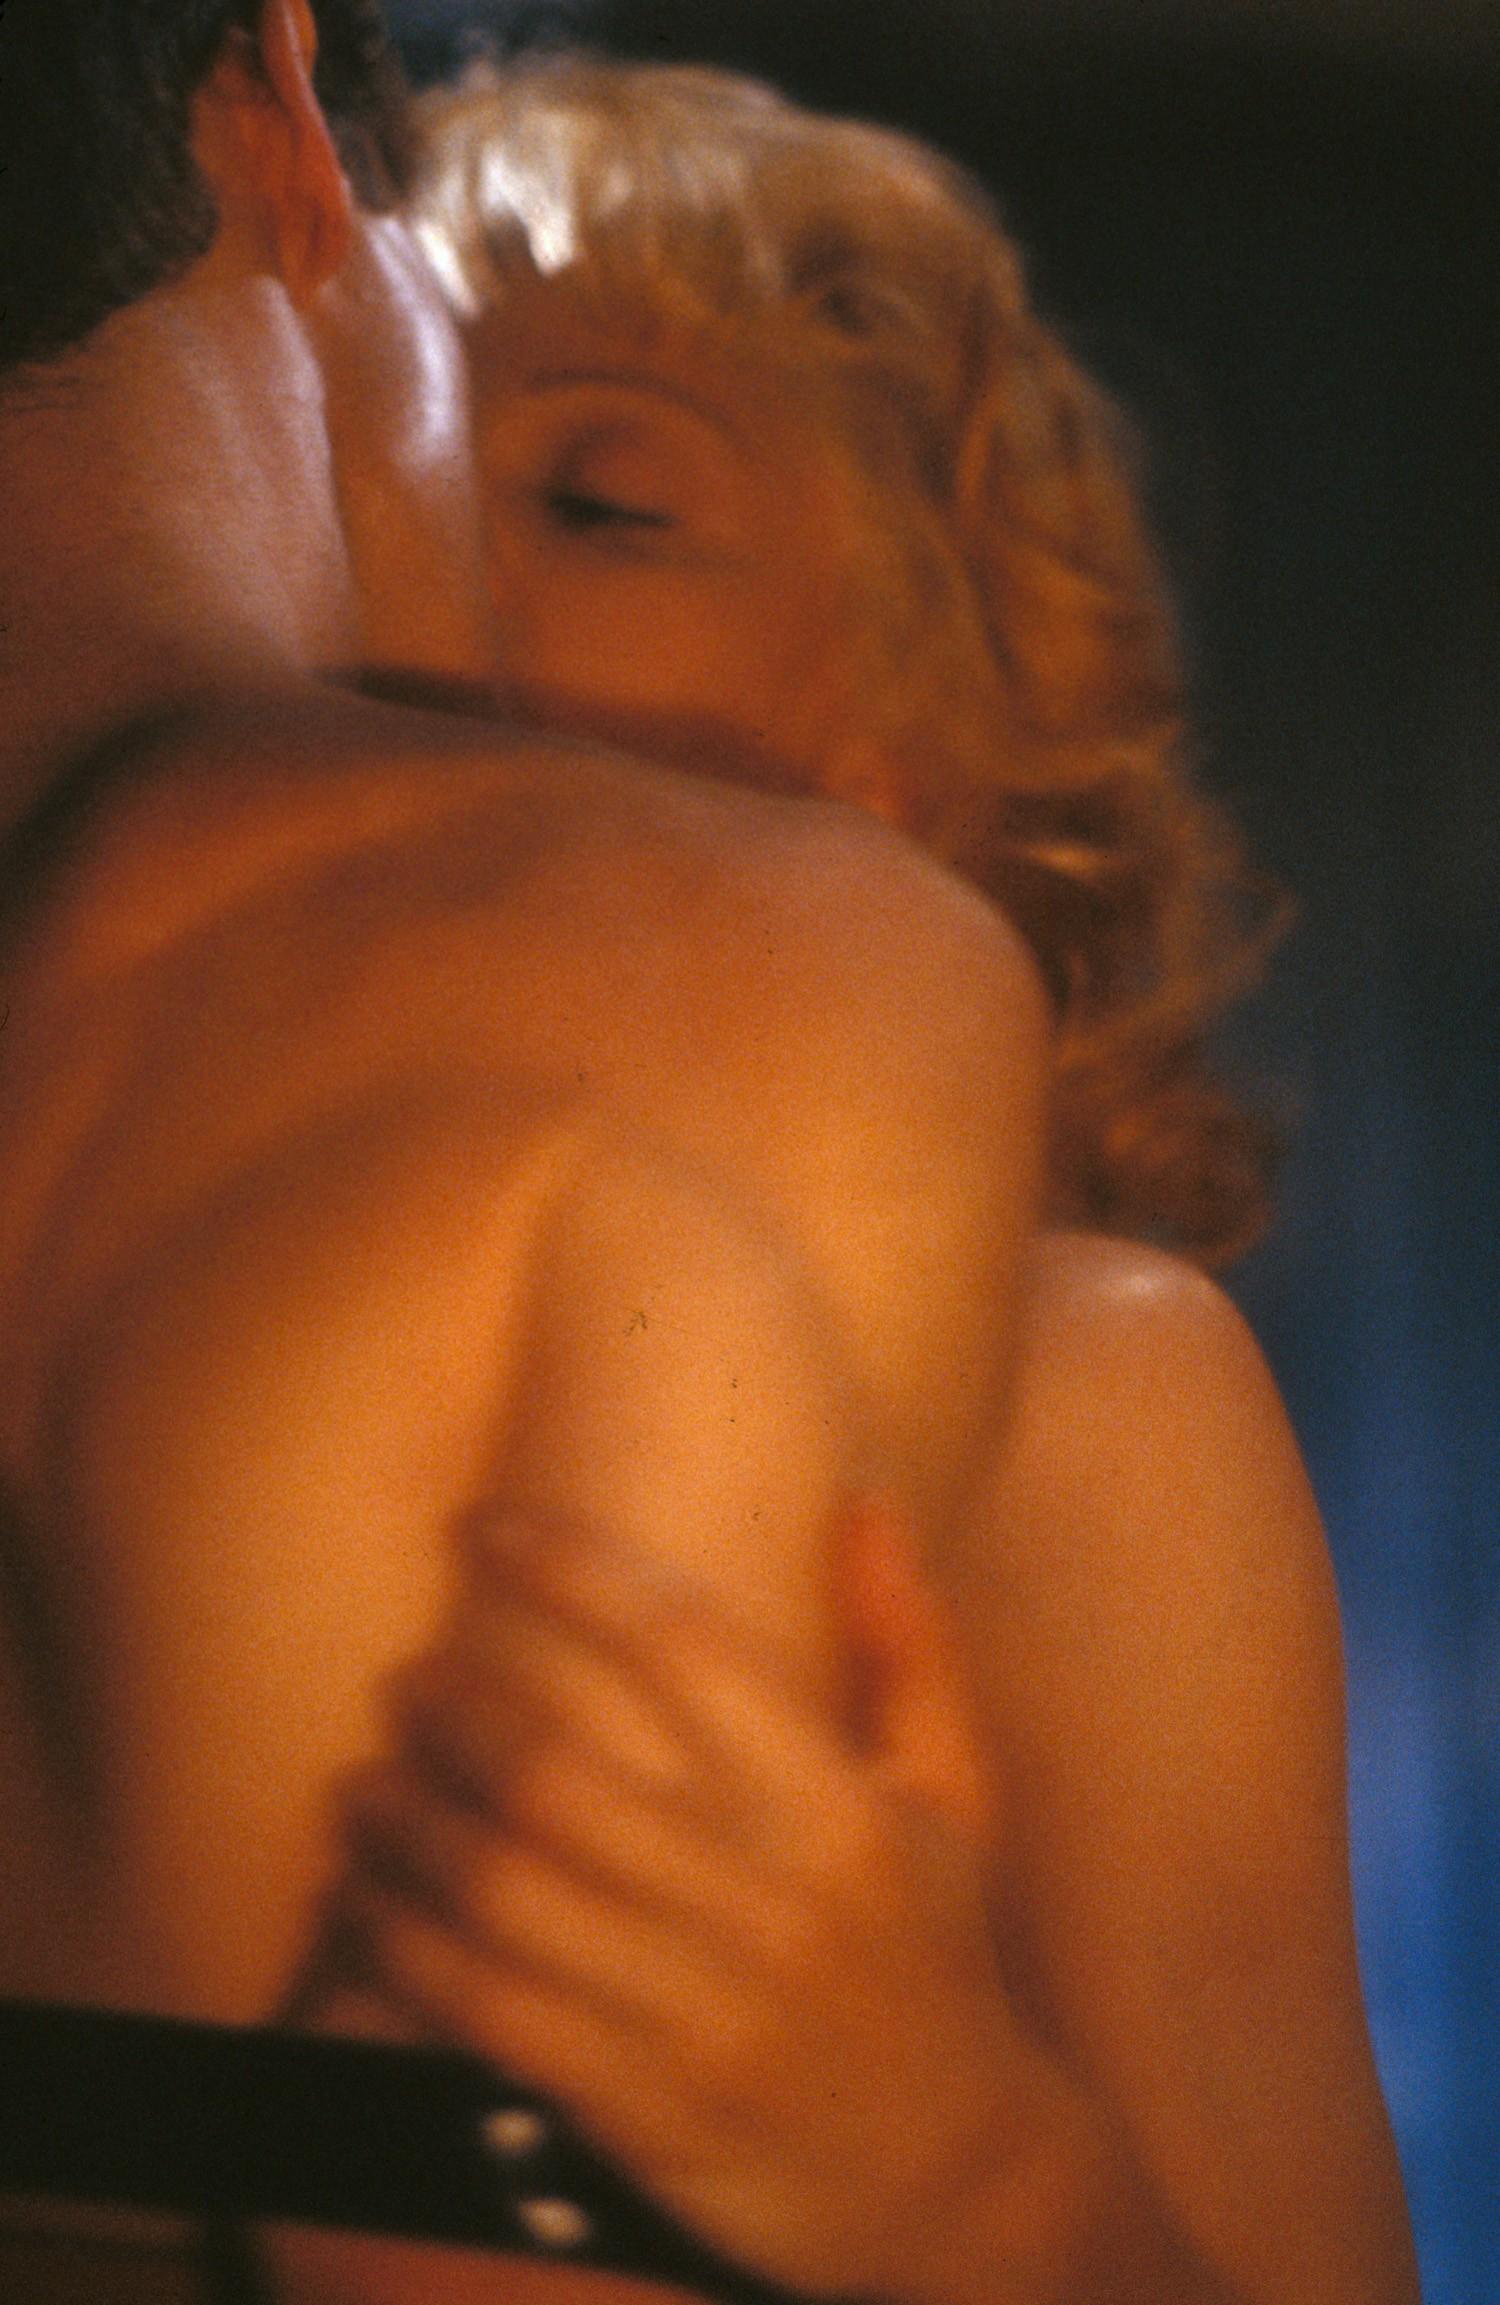 Madonna Ciccone,Willem Dafoe